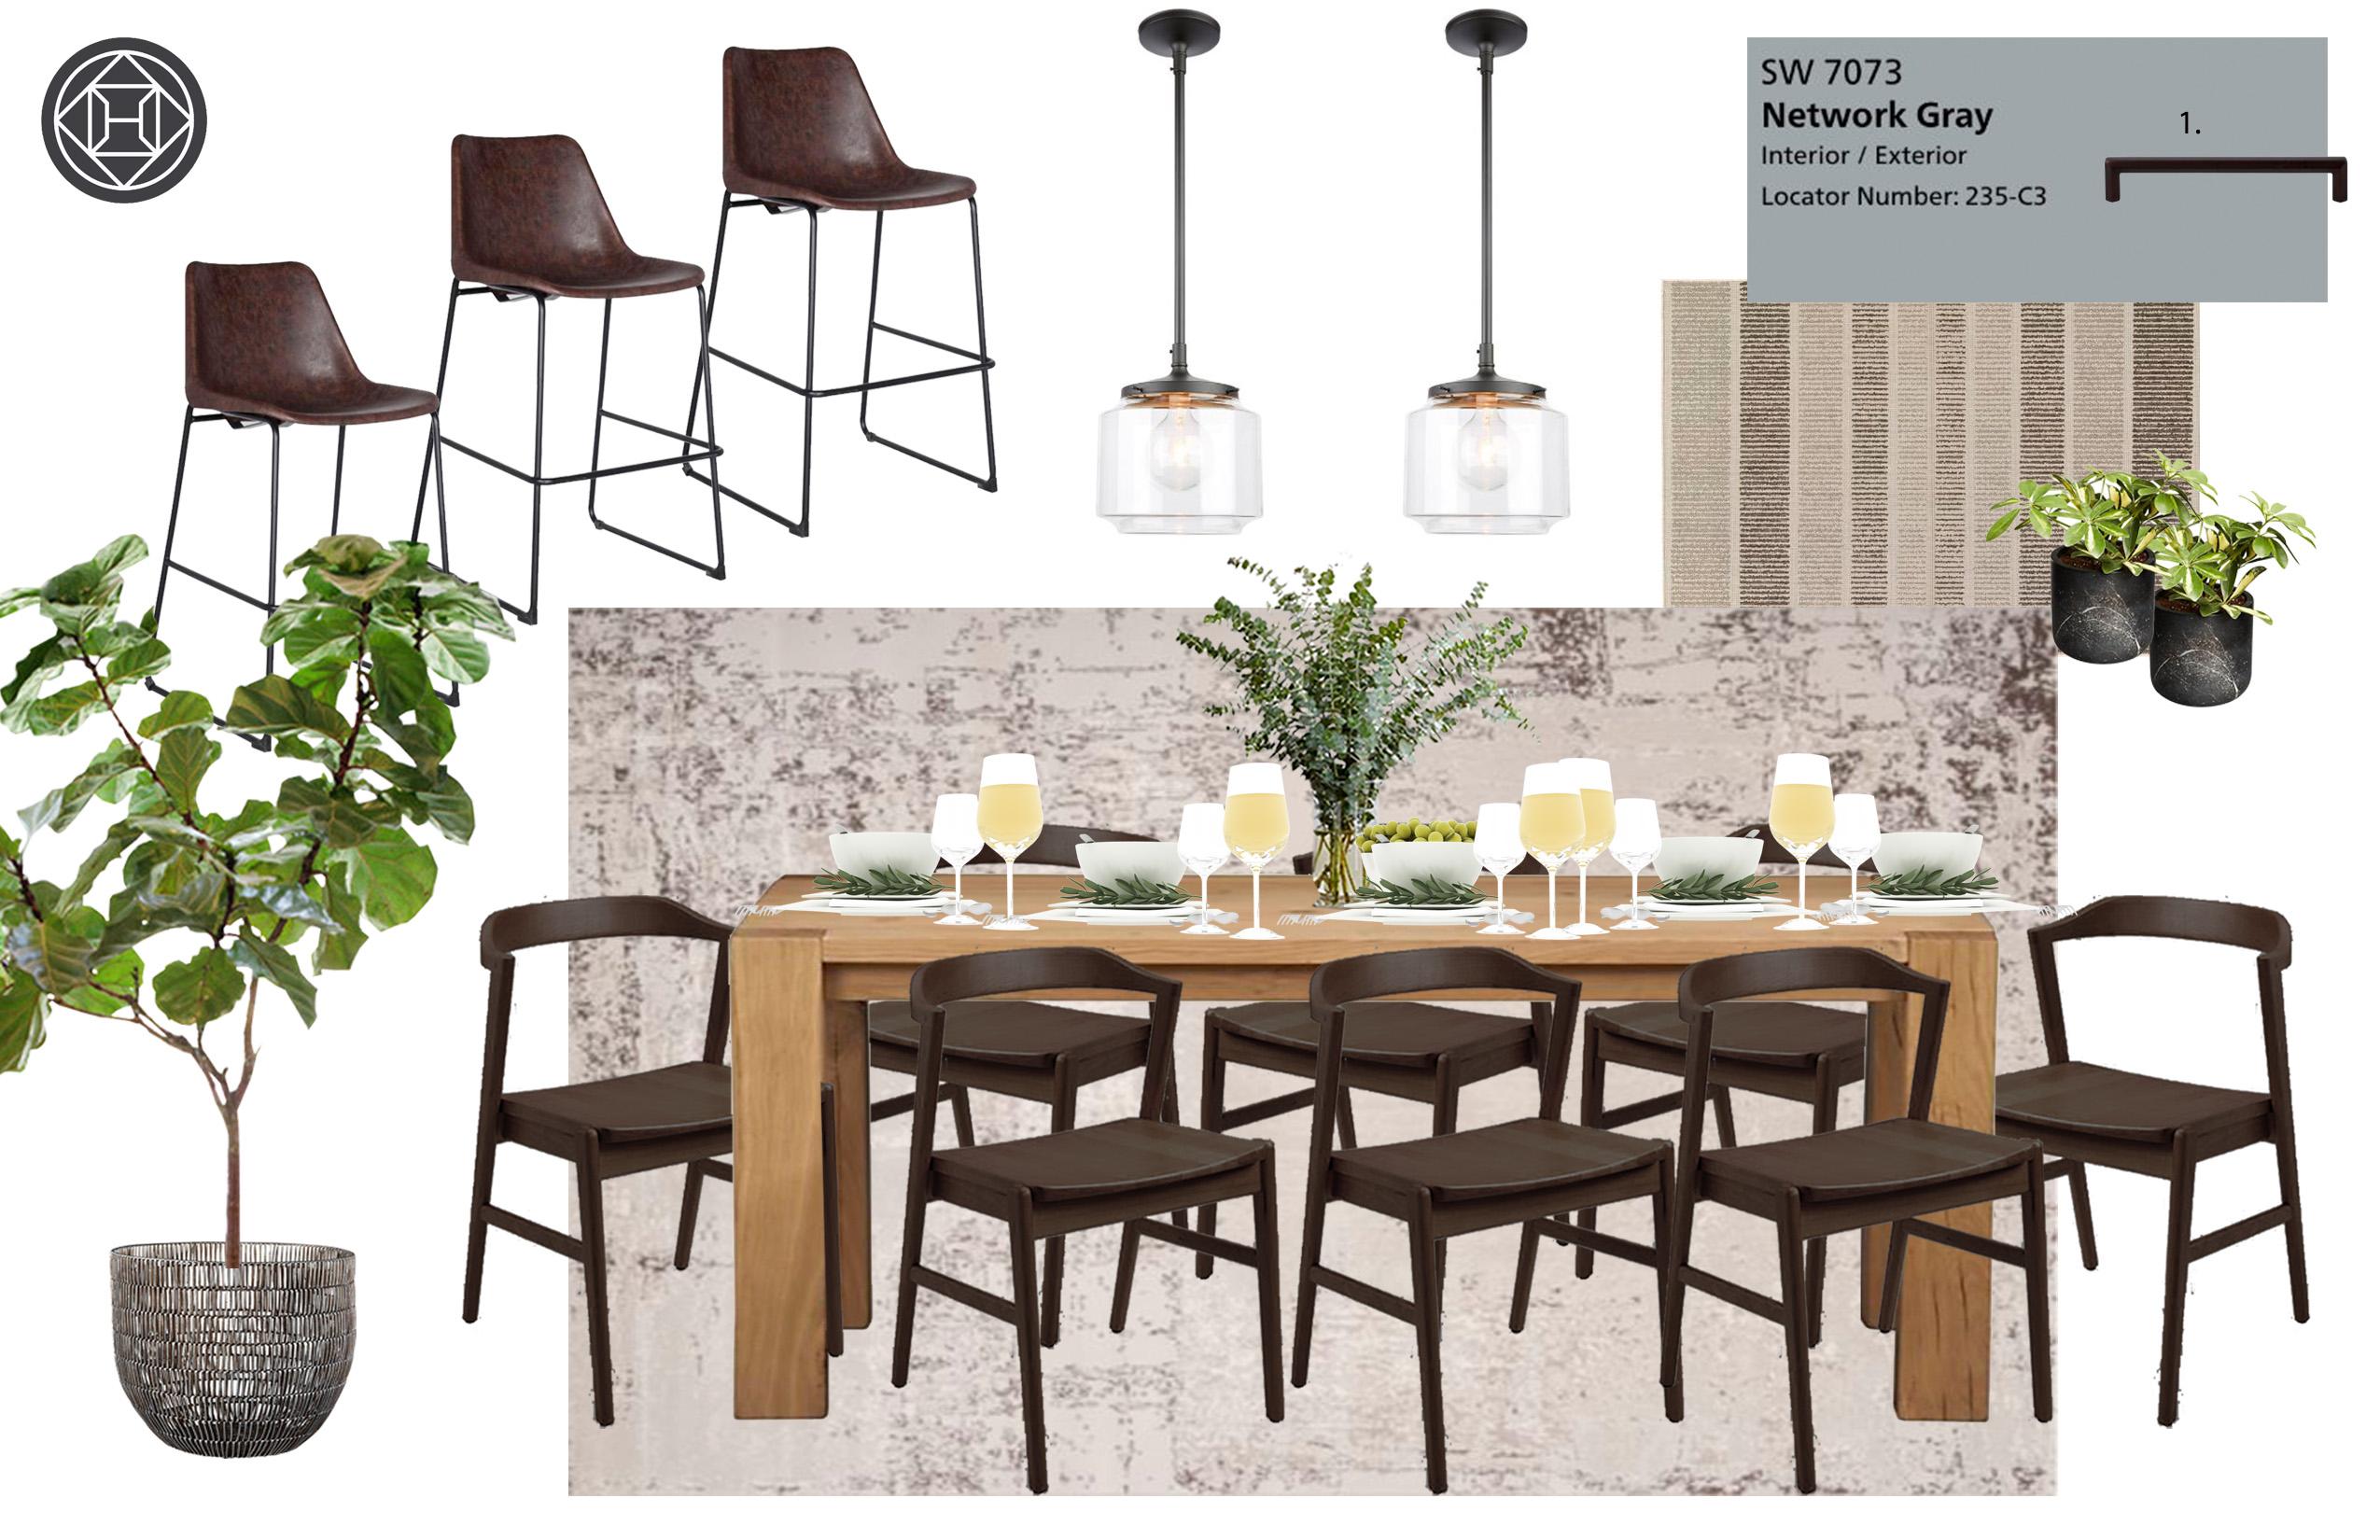 Industrial / Rustic Kitchen Interior Design By Nicolle